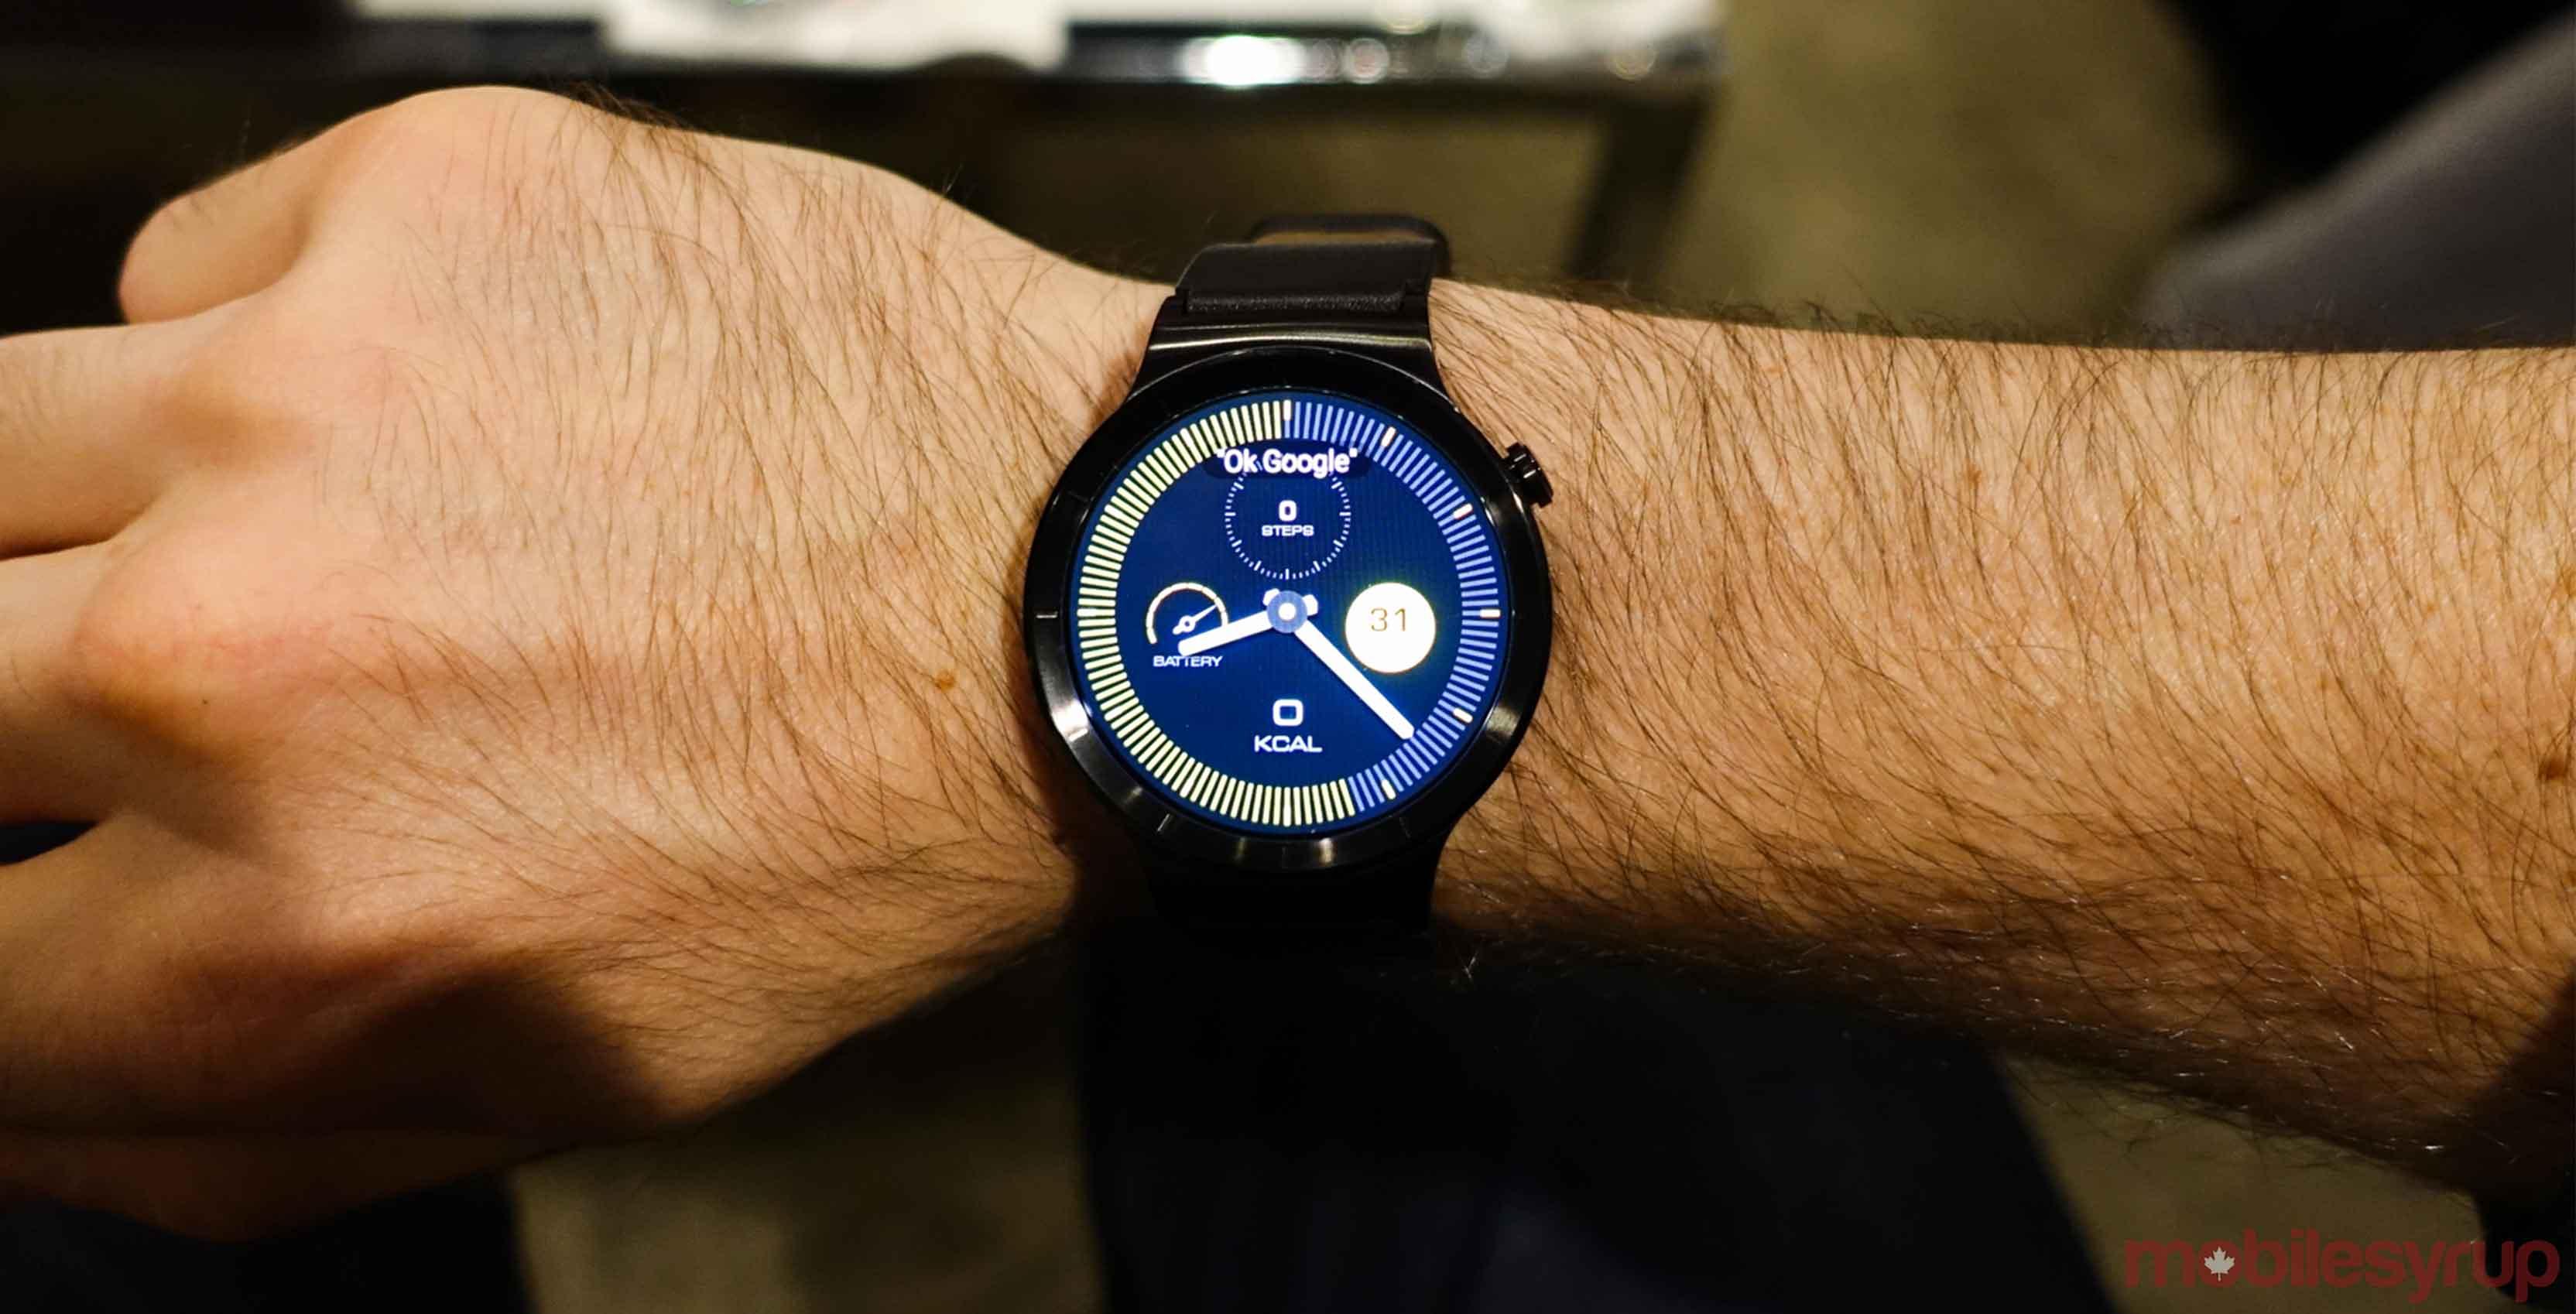 Huawei Watch 2 on wrist